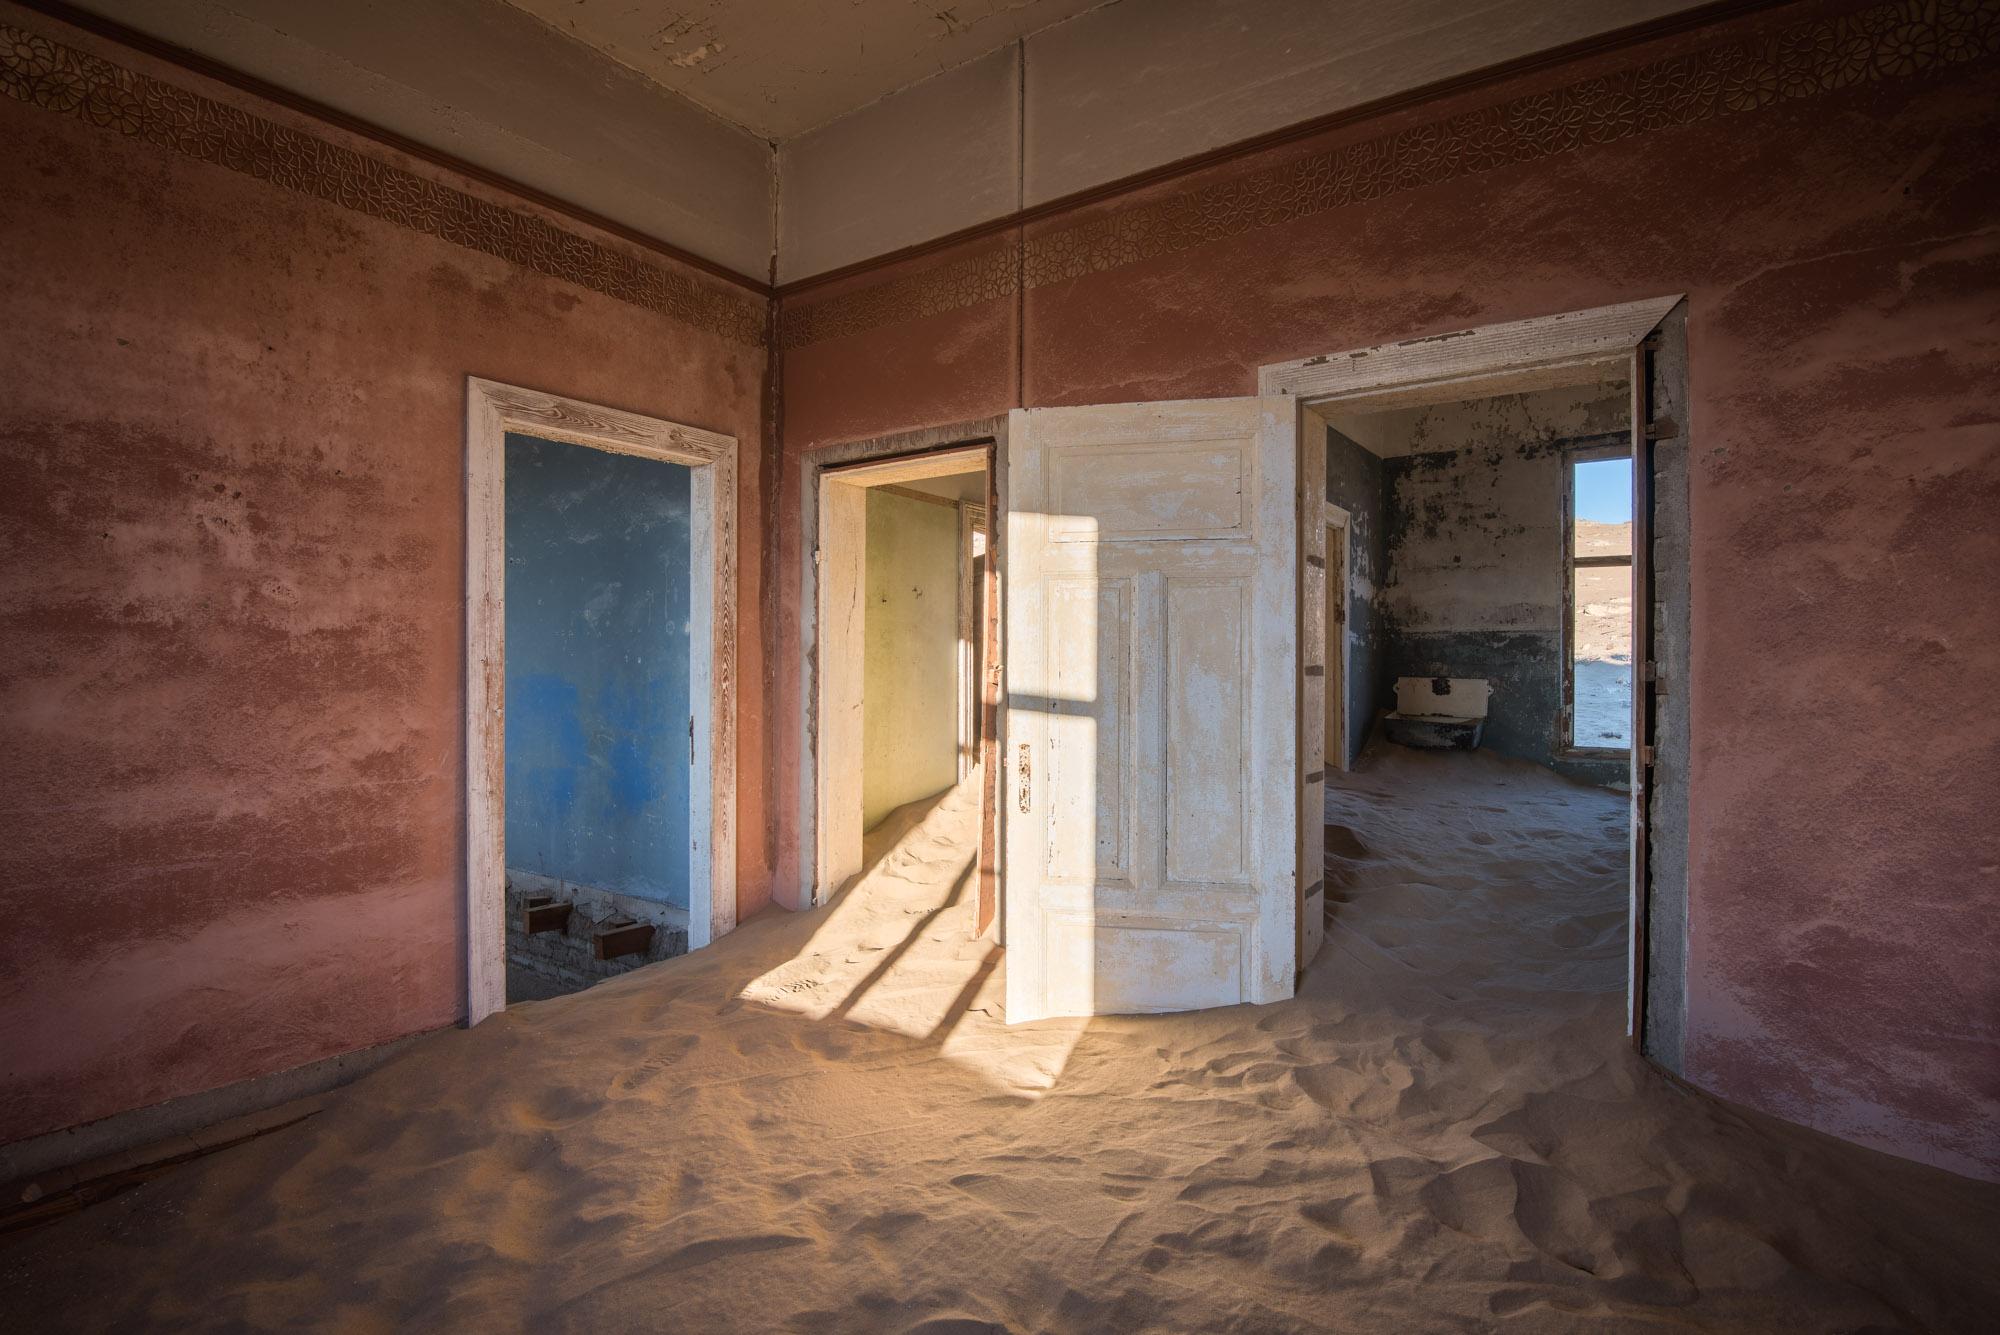 Sand Dunes taking over a Derelict House, Kolmanskop, Namibia